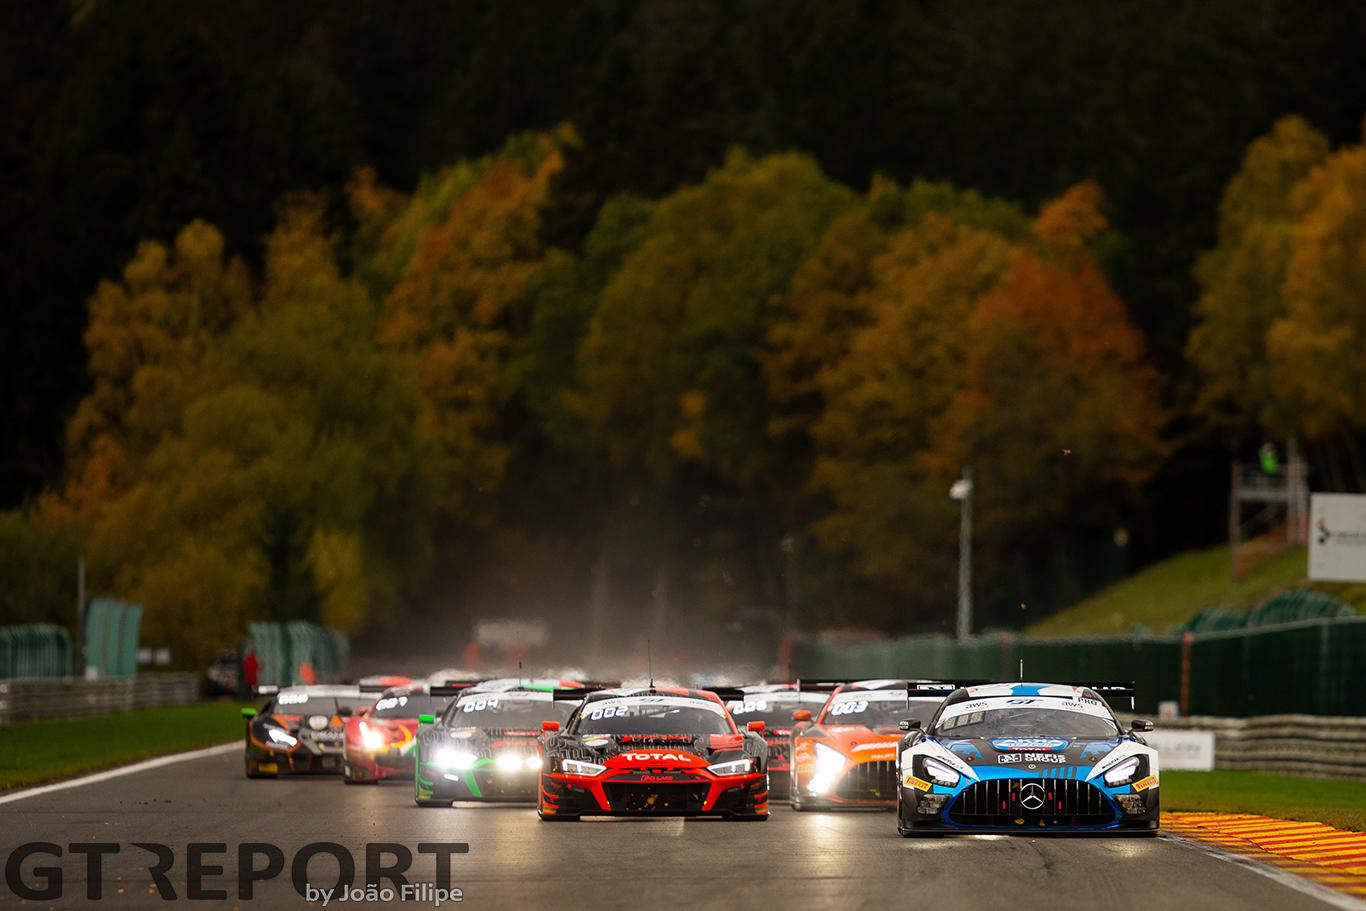 Spa 24 Hours race analysis